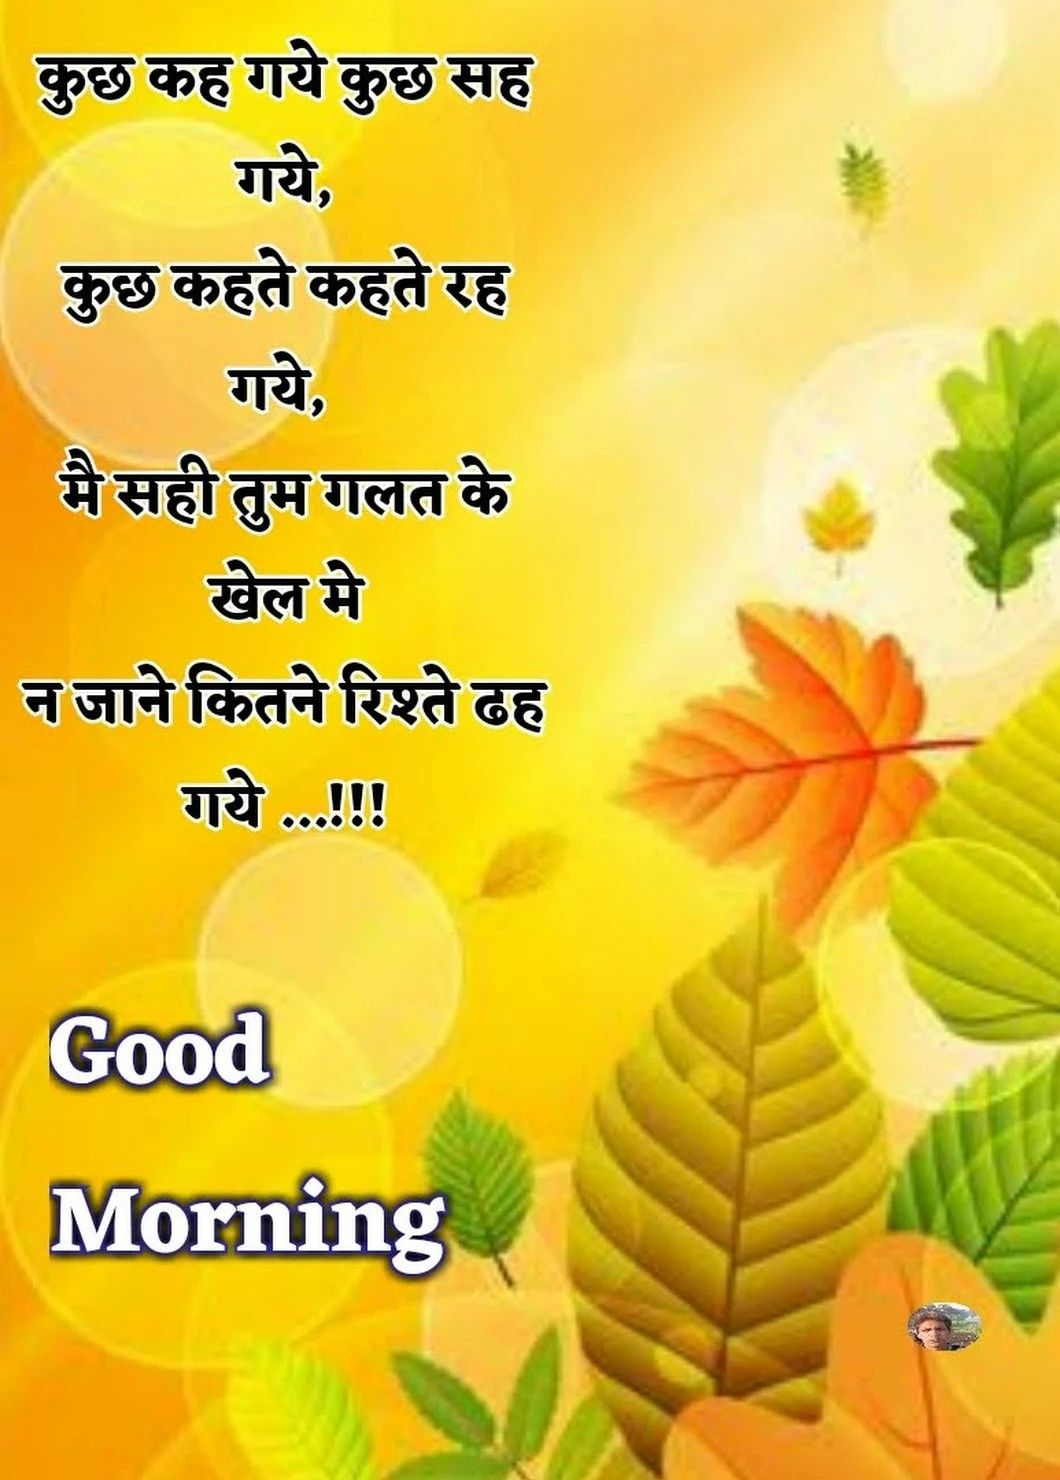 Pin by bhuvan shilpakar on Jokes   Hindi good morning ...